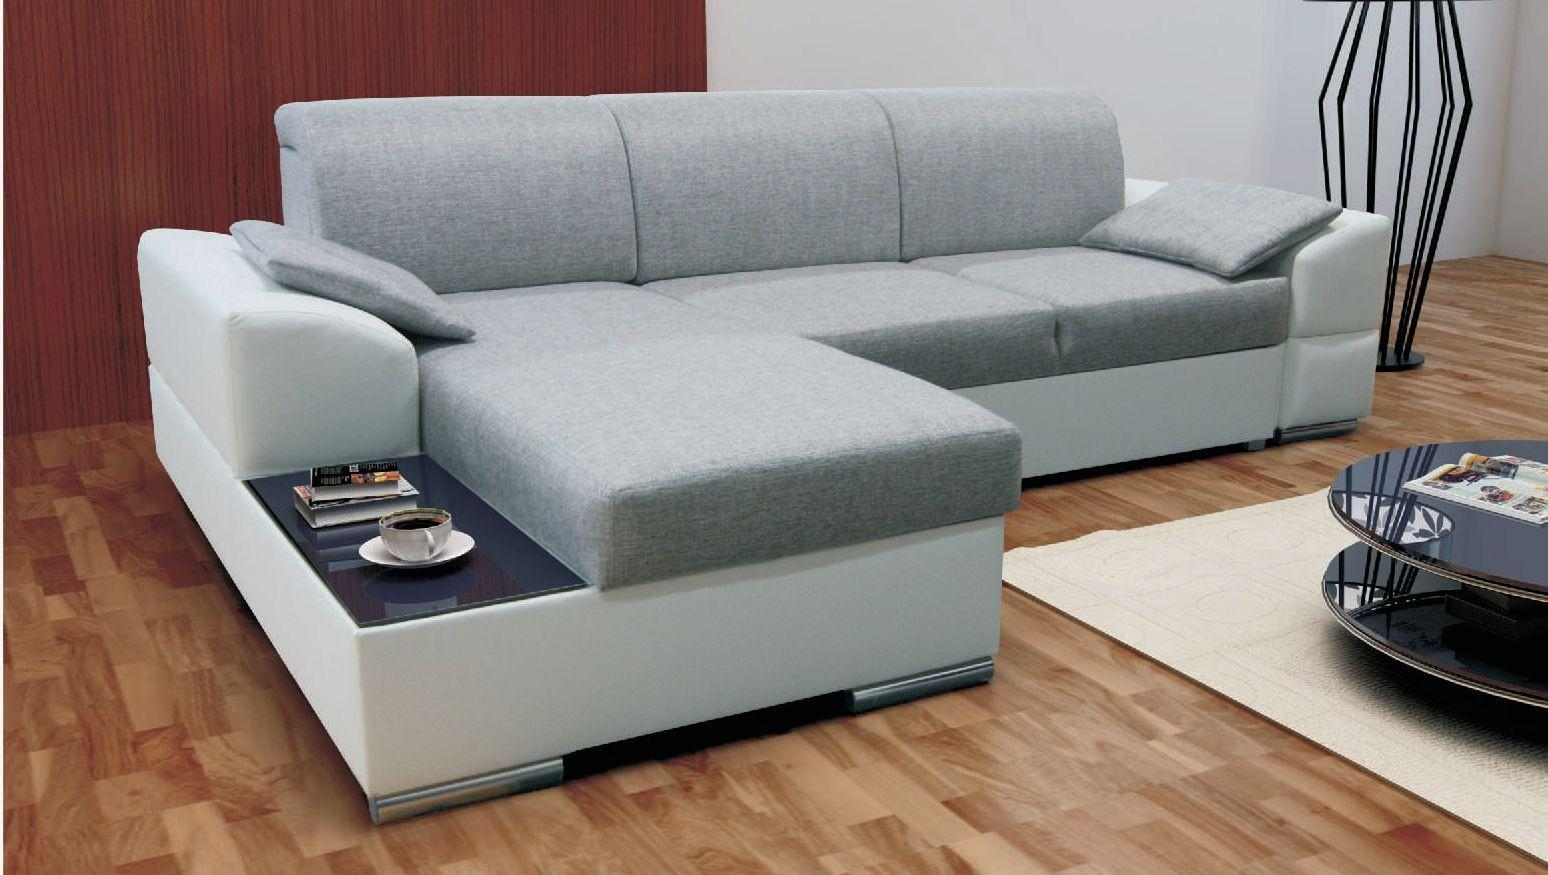 Sofas Center : Friheten Corner Sofa With Storage Skiftebo Dark With Regard To Corner Sofa Bed With Storage Ikea (View 8 of 20)